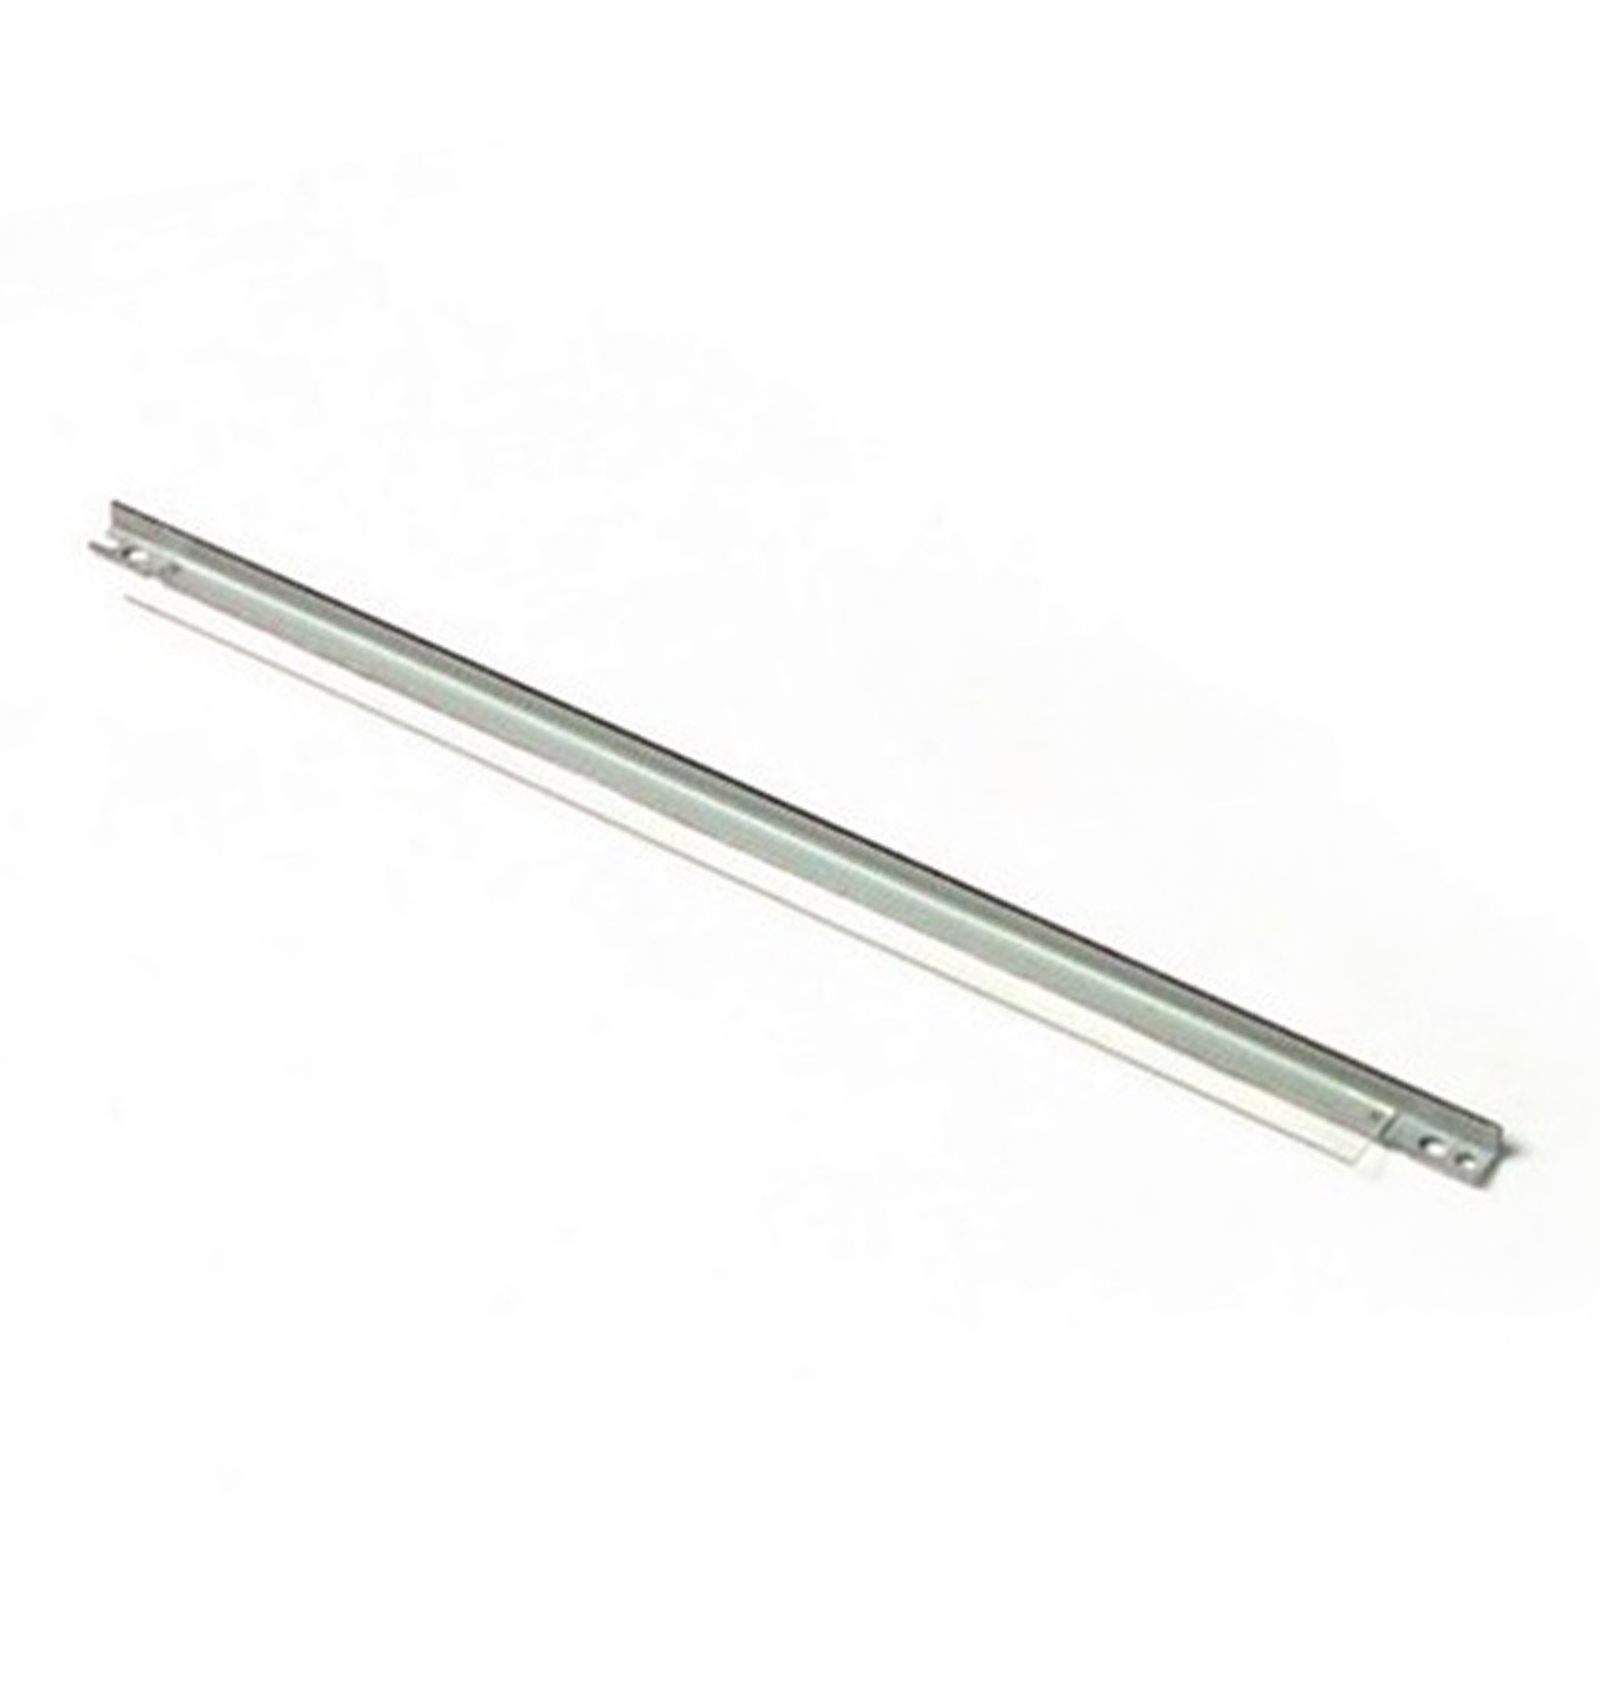 Замена дозирующего лезвия магнитного вала картриджа HP Q7553A/X (53A/X) для LaserJet P2014/P2015/P2015d/P2015dn/M2727nf /M2727nfs